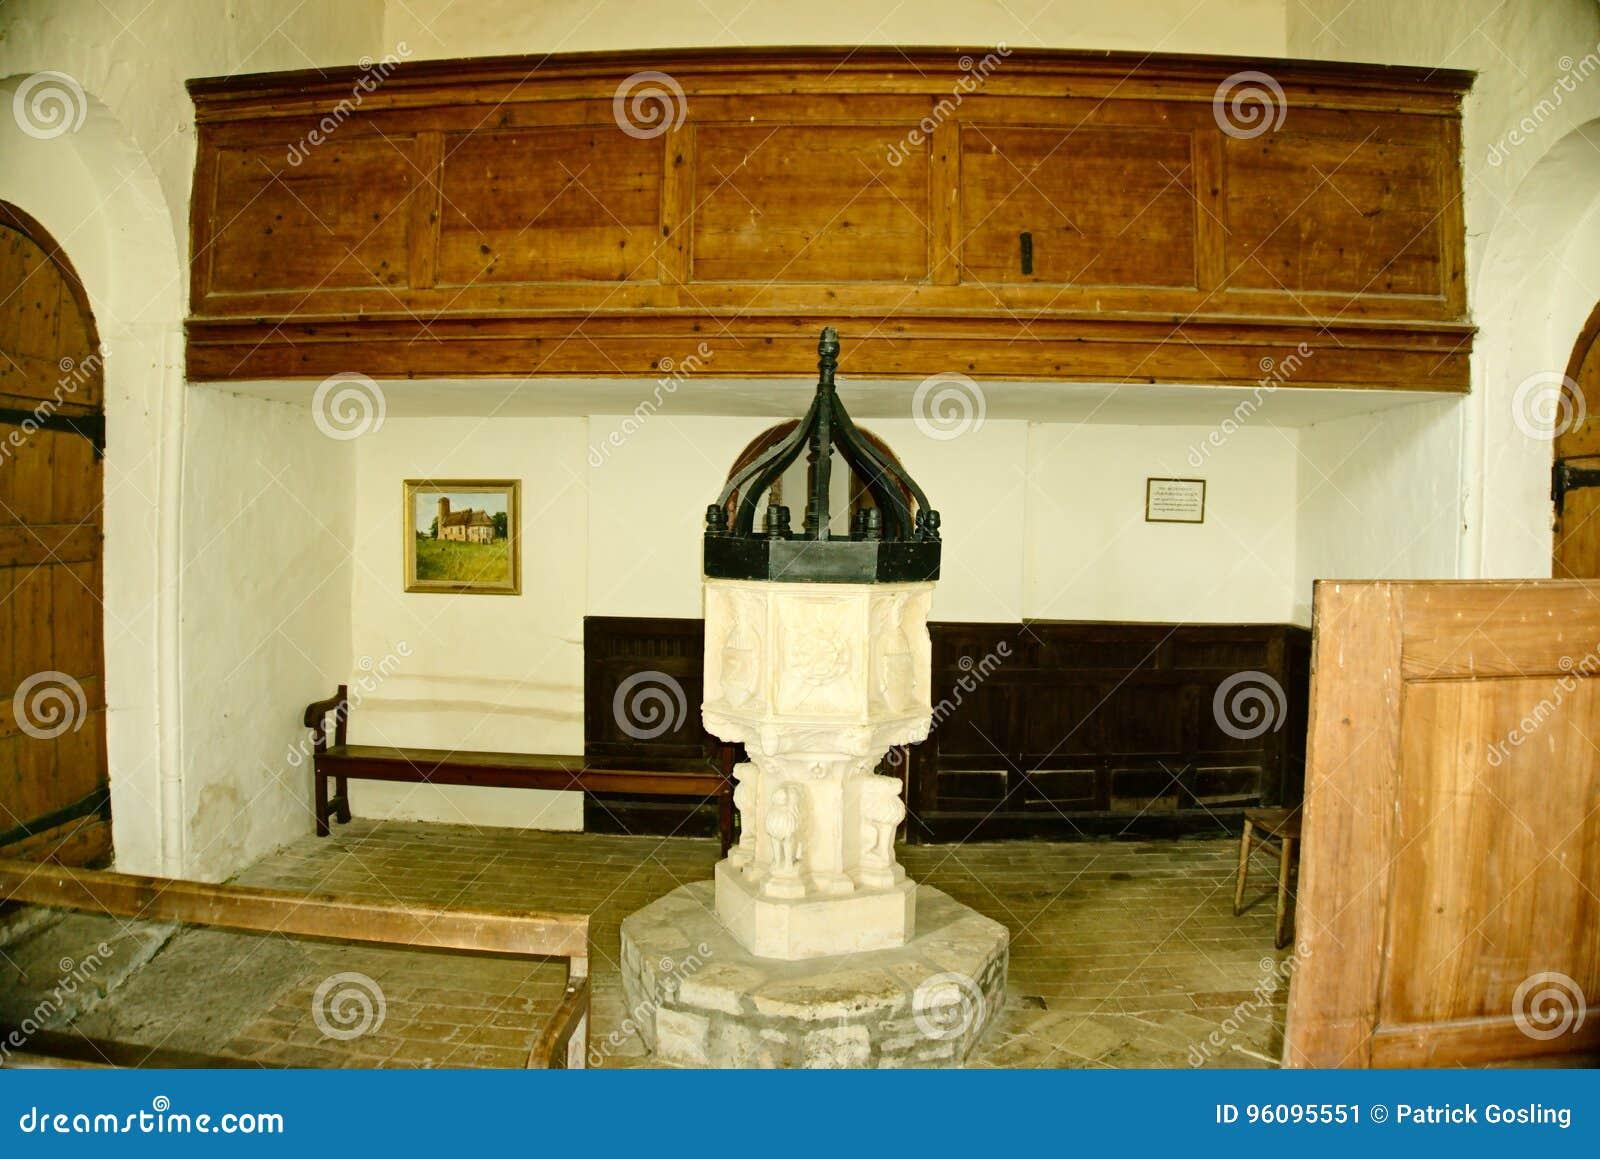 Original Norman Style House In Livarot France Royalty